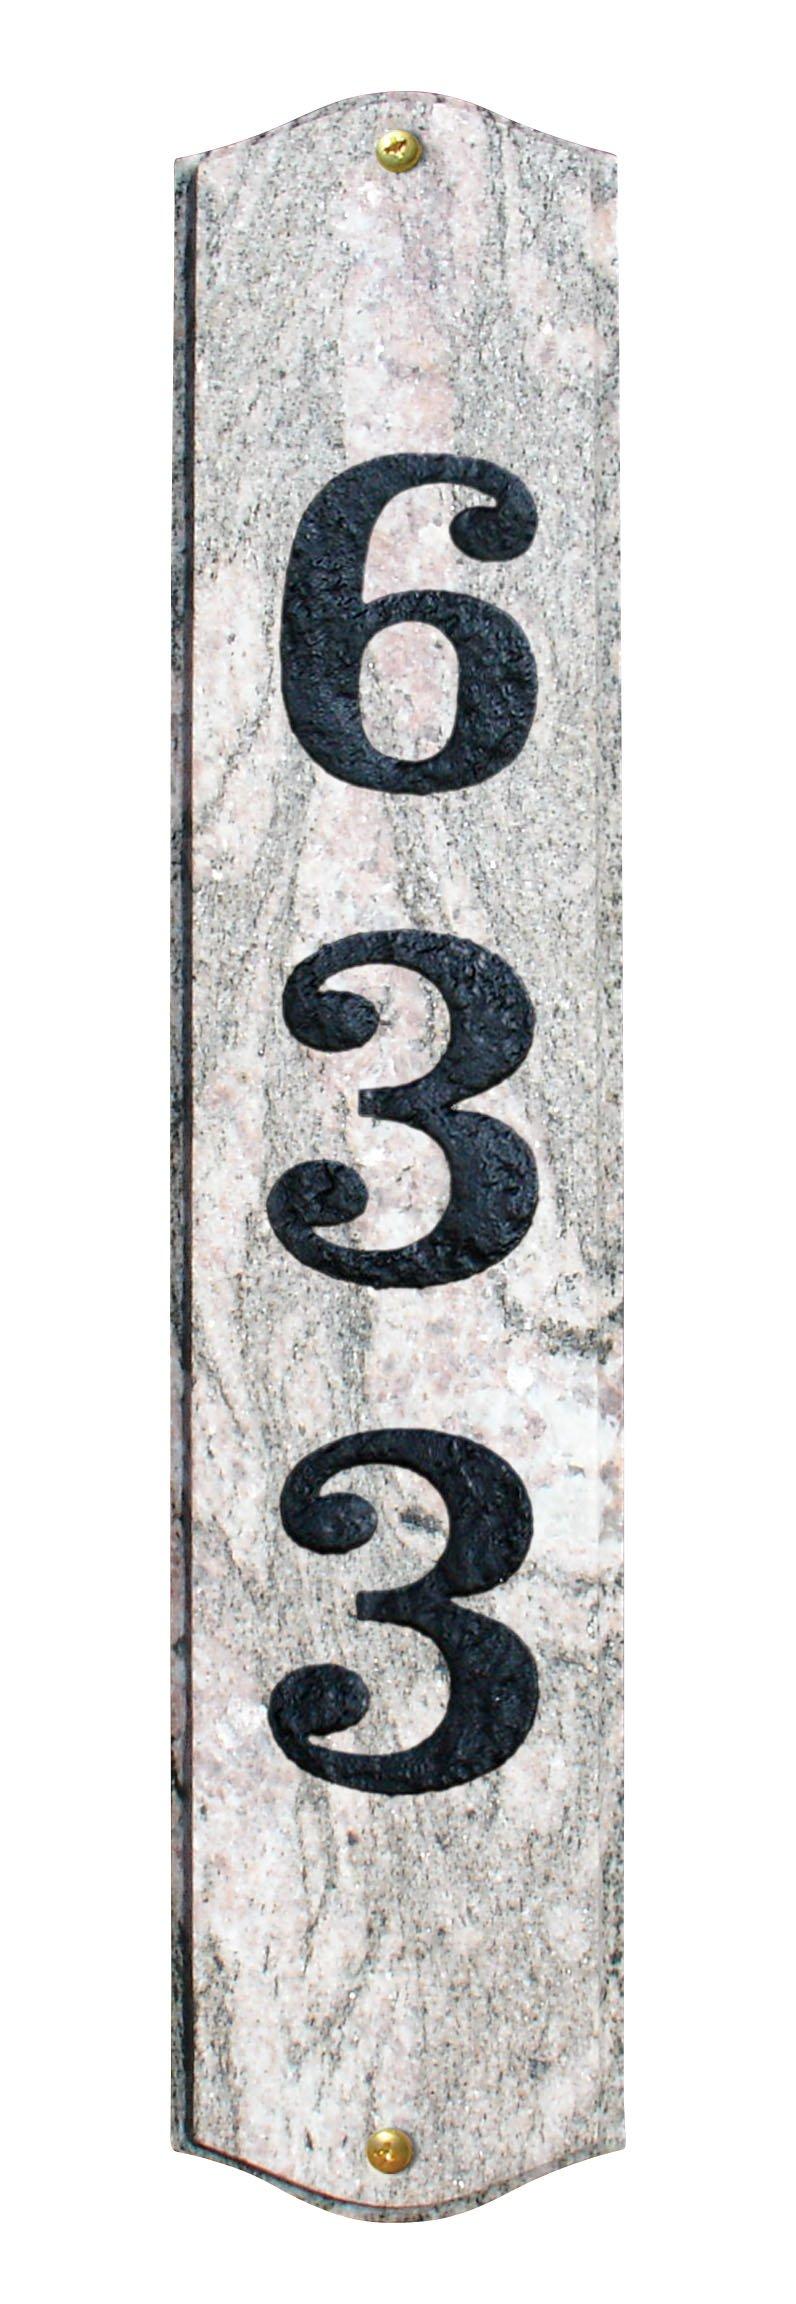 QualArc WEX-4719FC Wexford Vertical Granite Address Plaque in Five Color Natural Stone Color